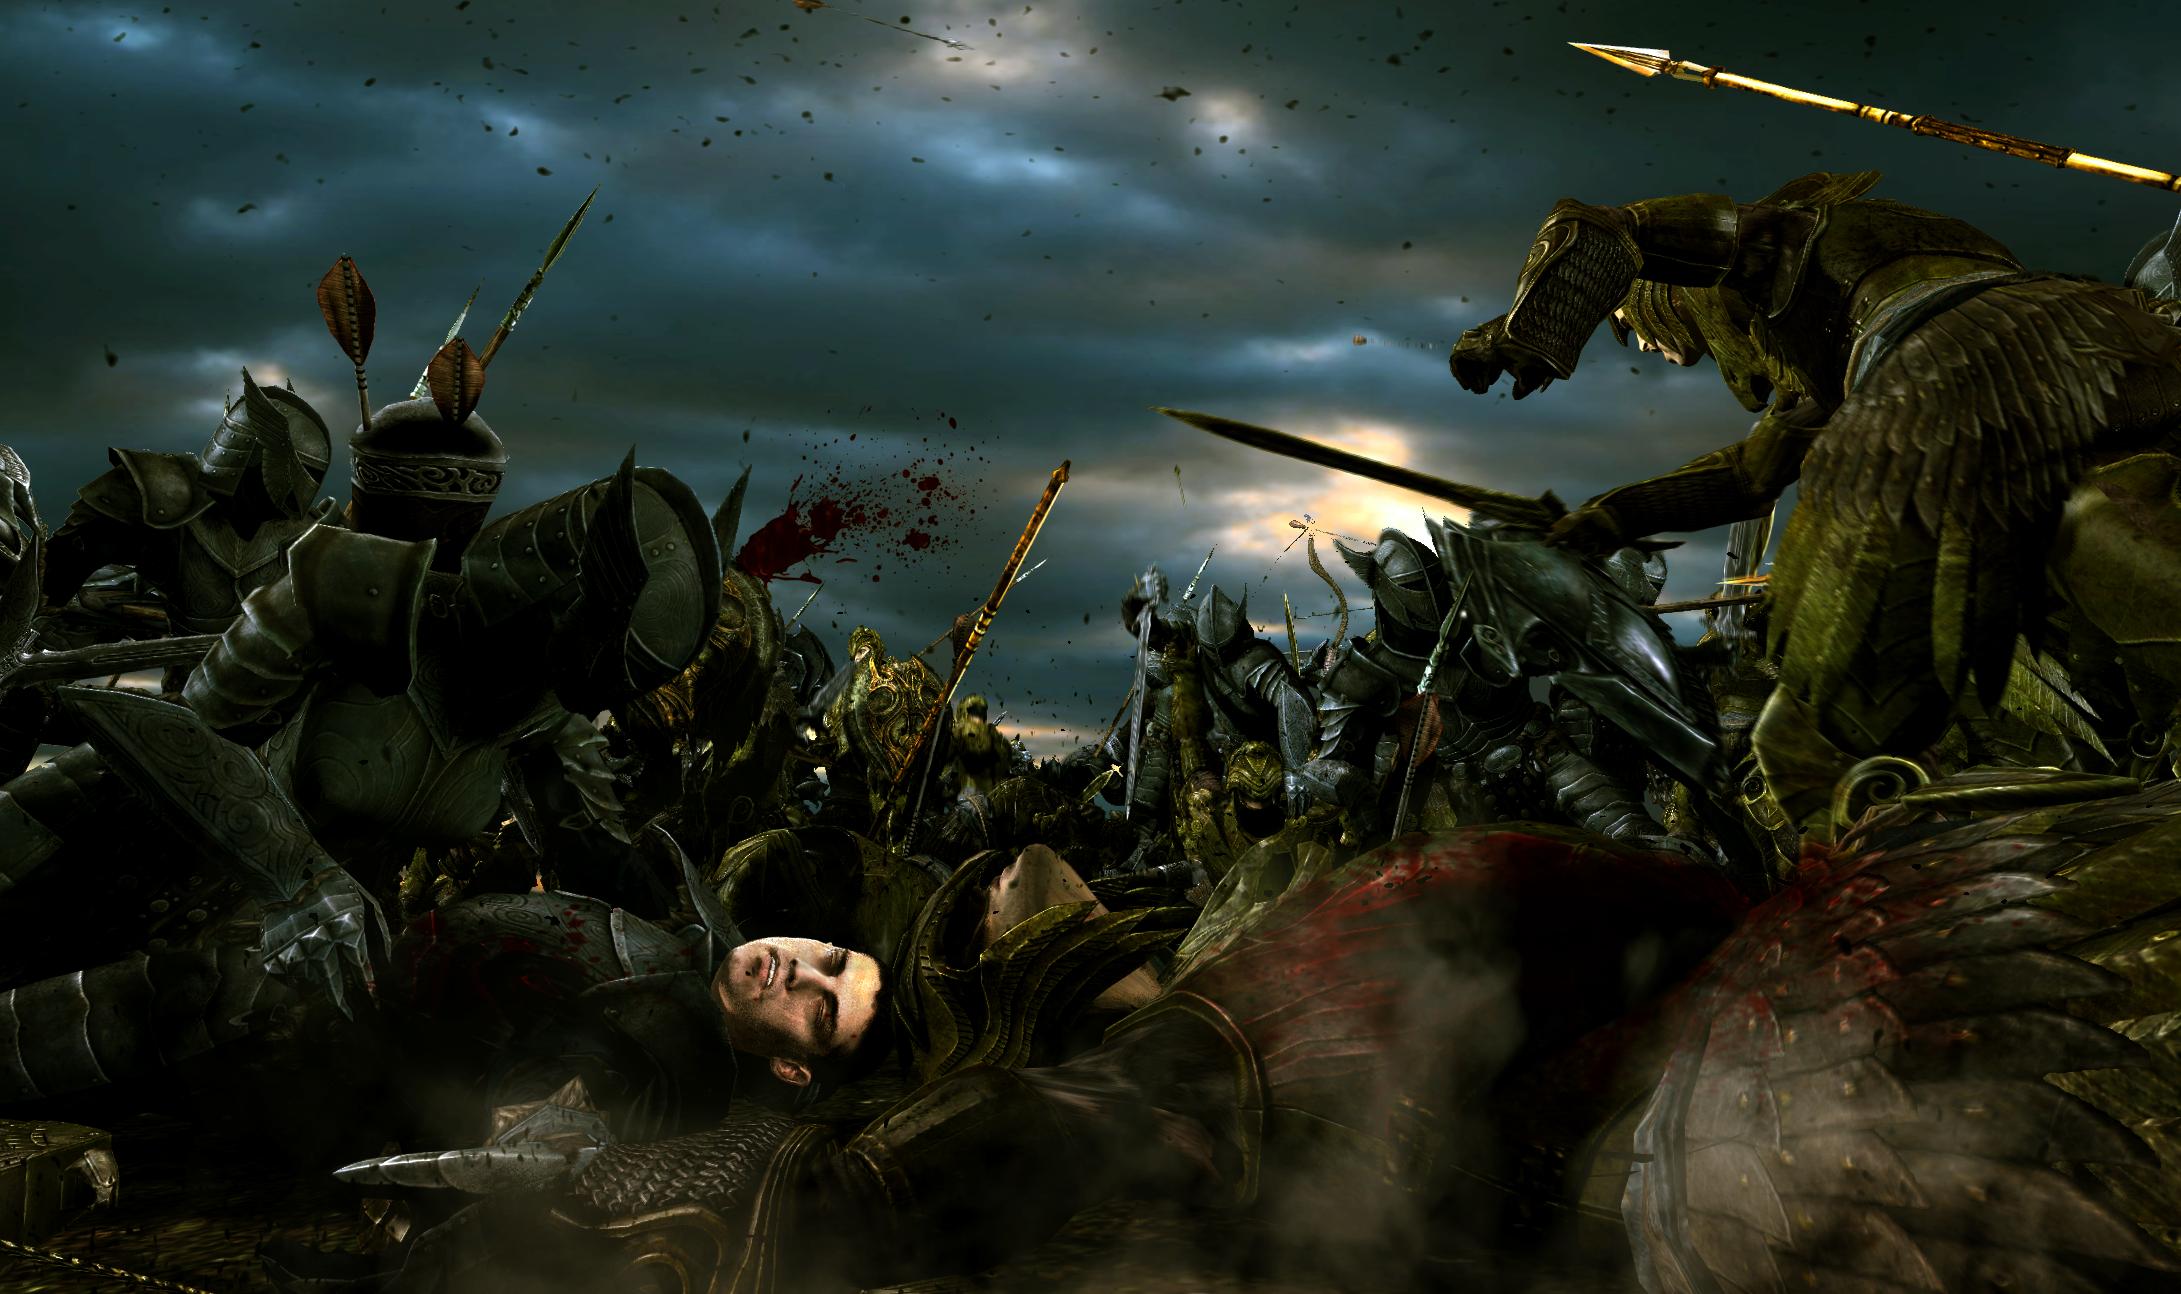 This Hellish Battle by LordHayabusa357